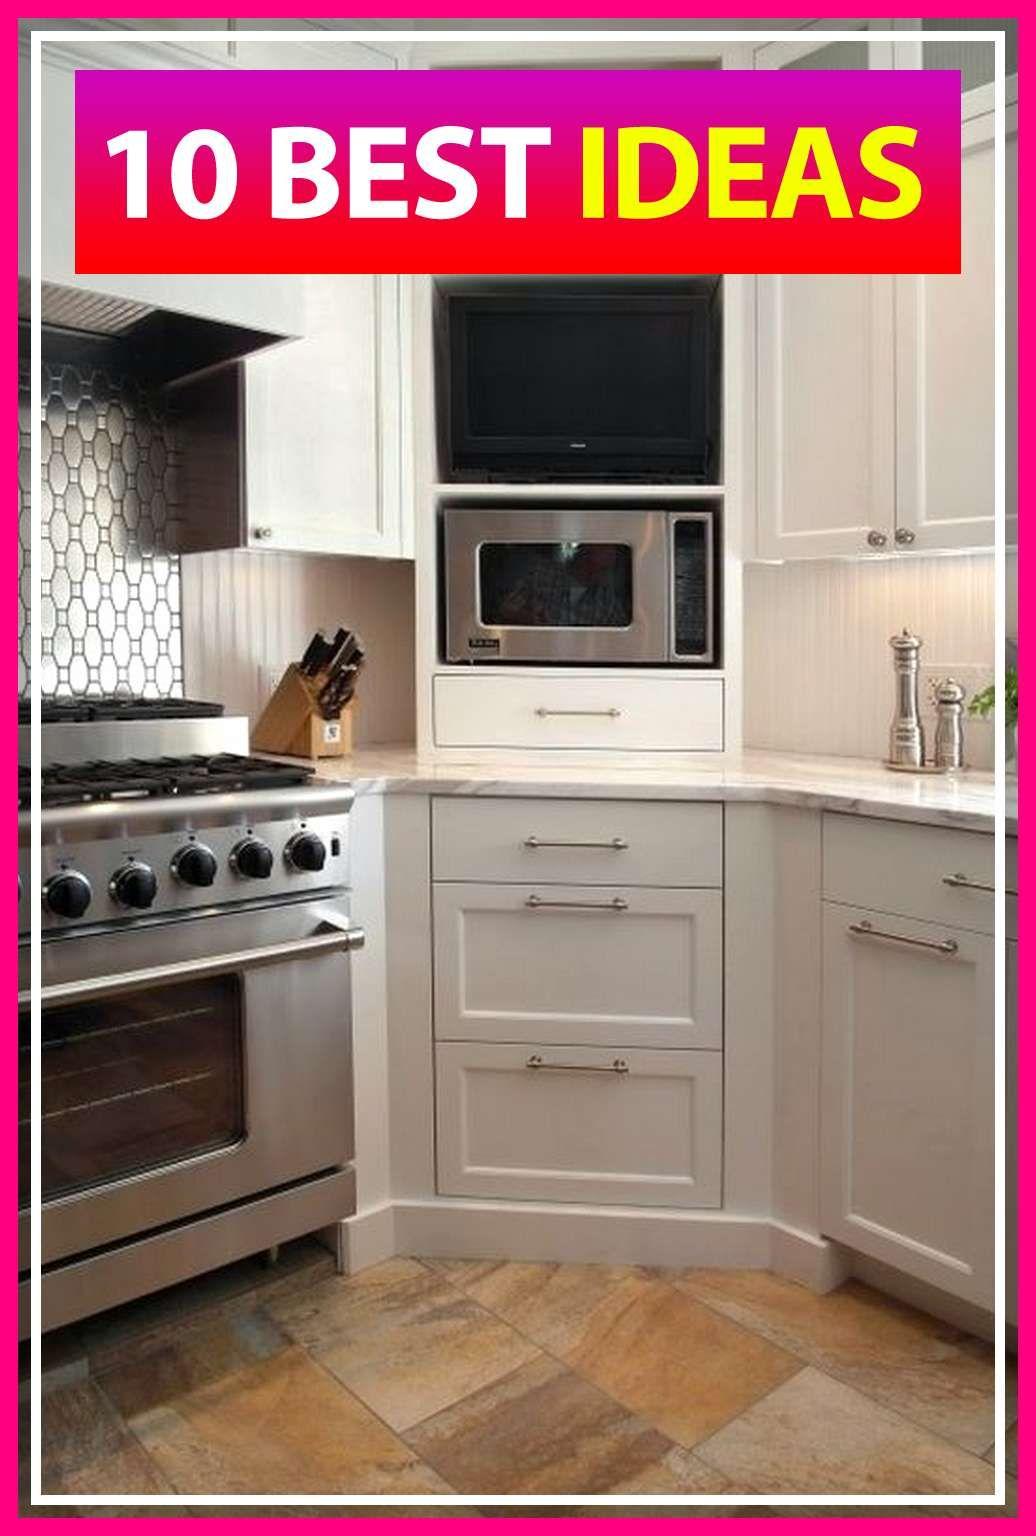 10 Stylish Kitchen Cabinets With Microwave Shelf Ideas Kitchen Cabinet Design New Kitchen Cabinets Corner Kitchen Cabinet